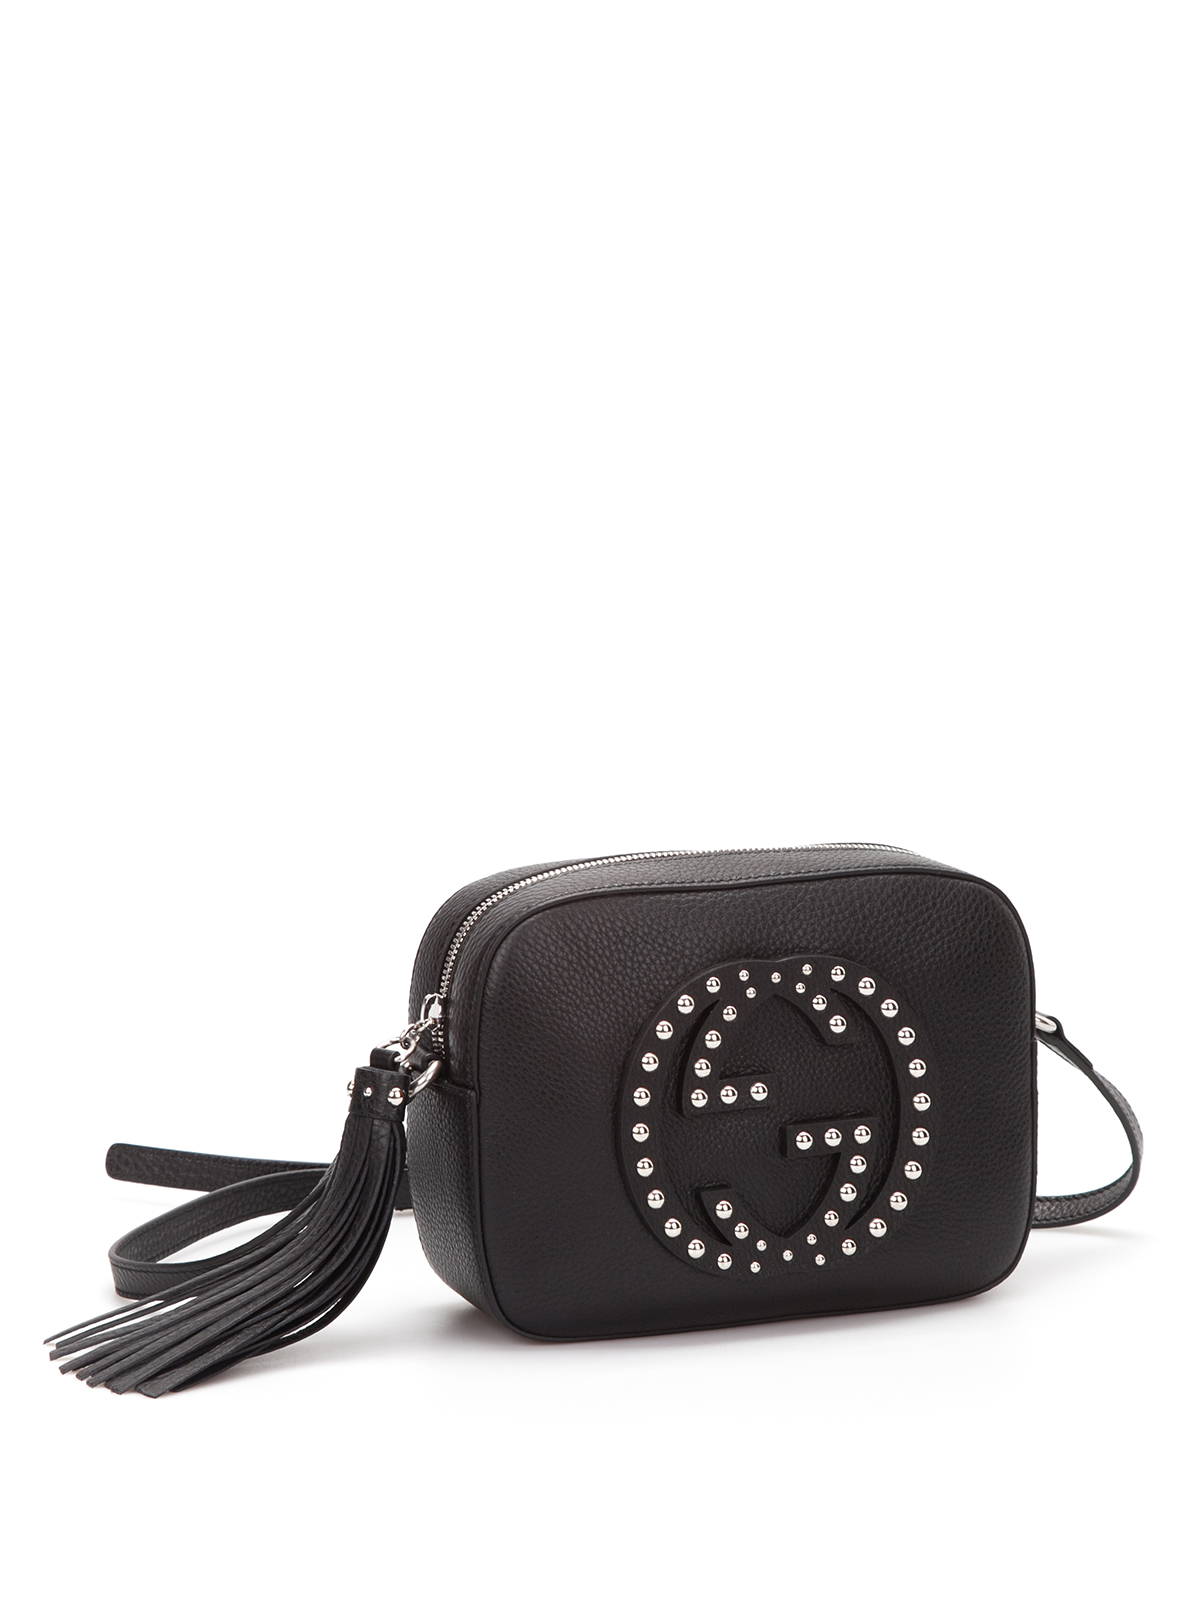 b49775bffbf Gucci - Soho studded leather disco bag - shoulder bags - 308364 ...